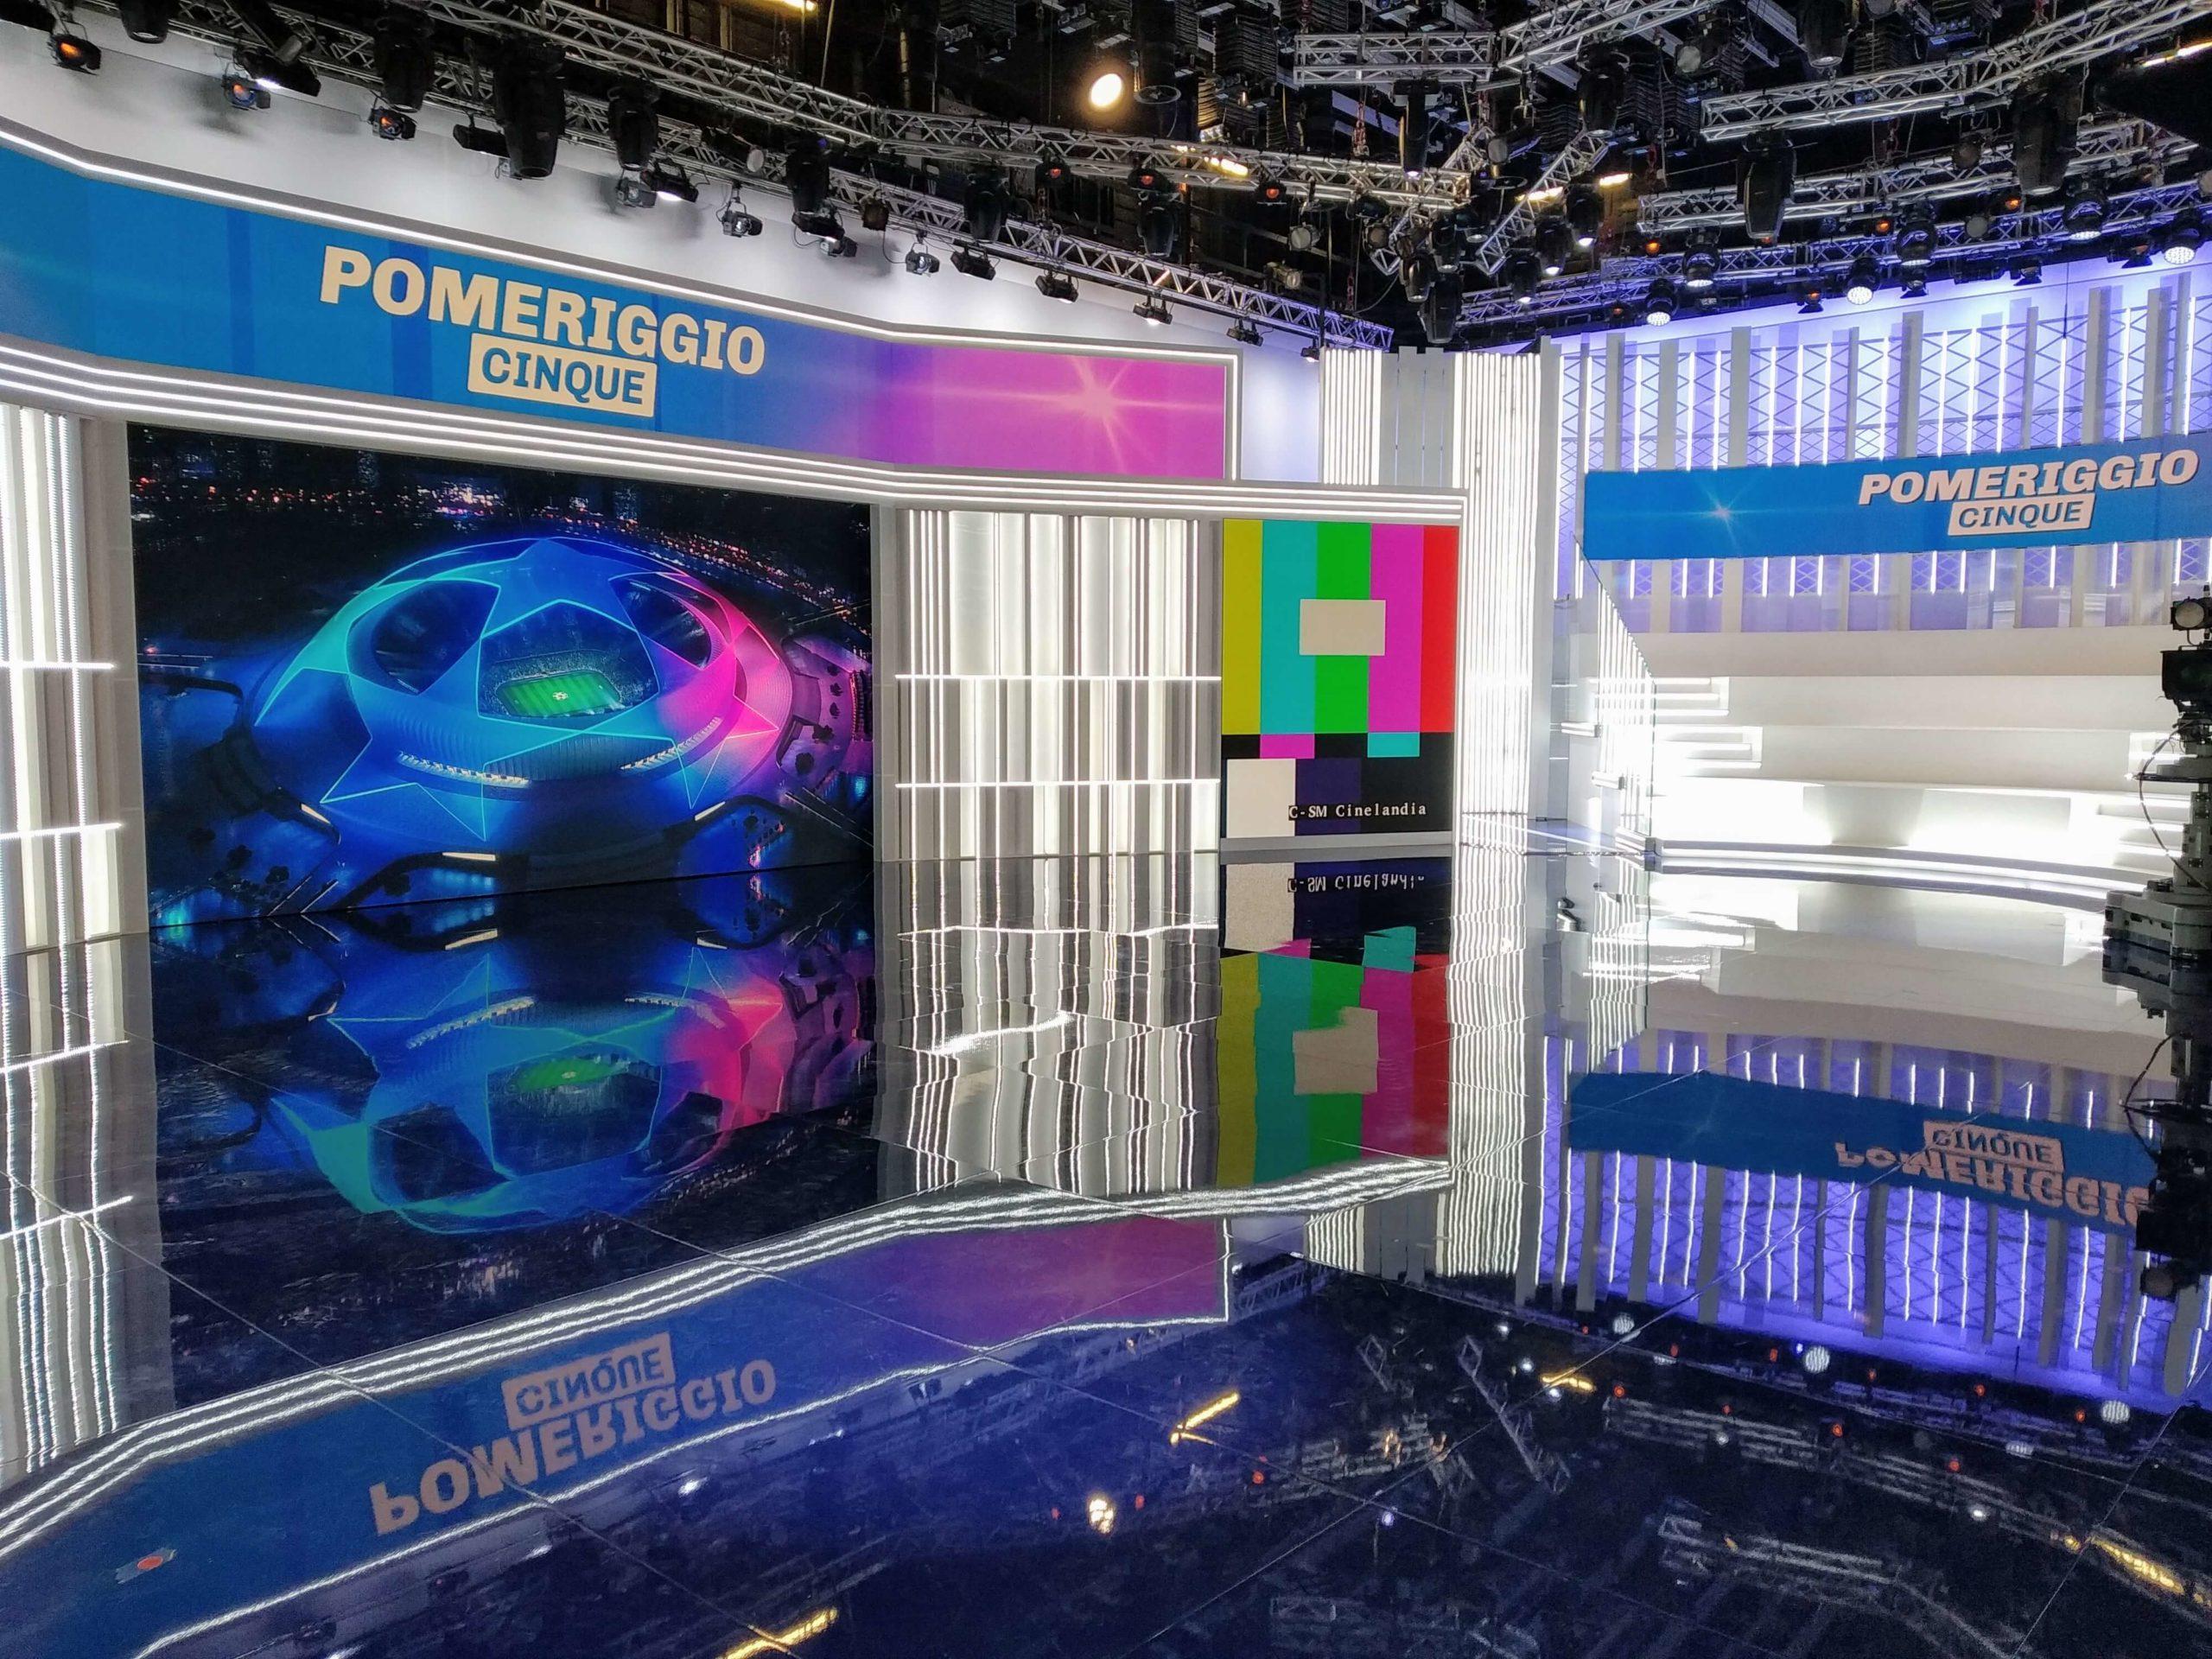 Ledwall per trasmissioni televisive